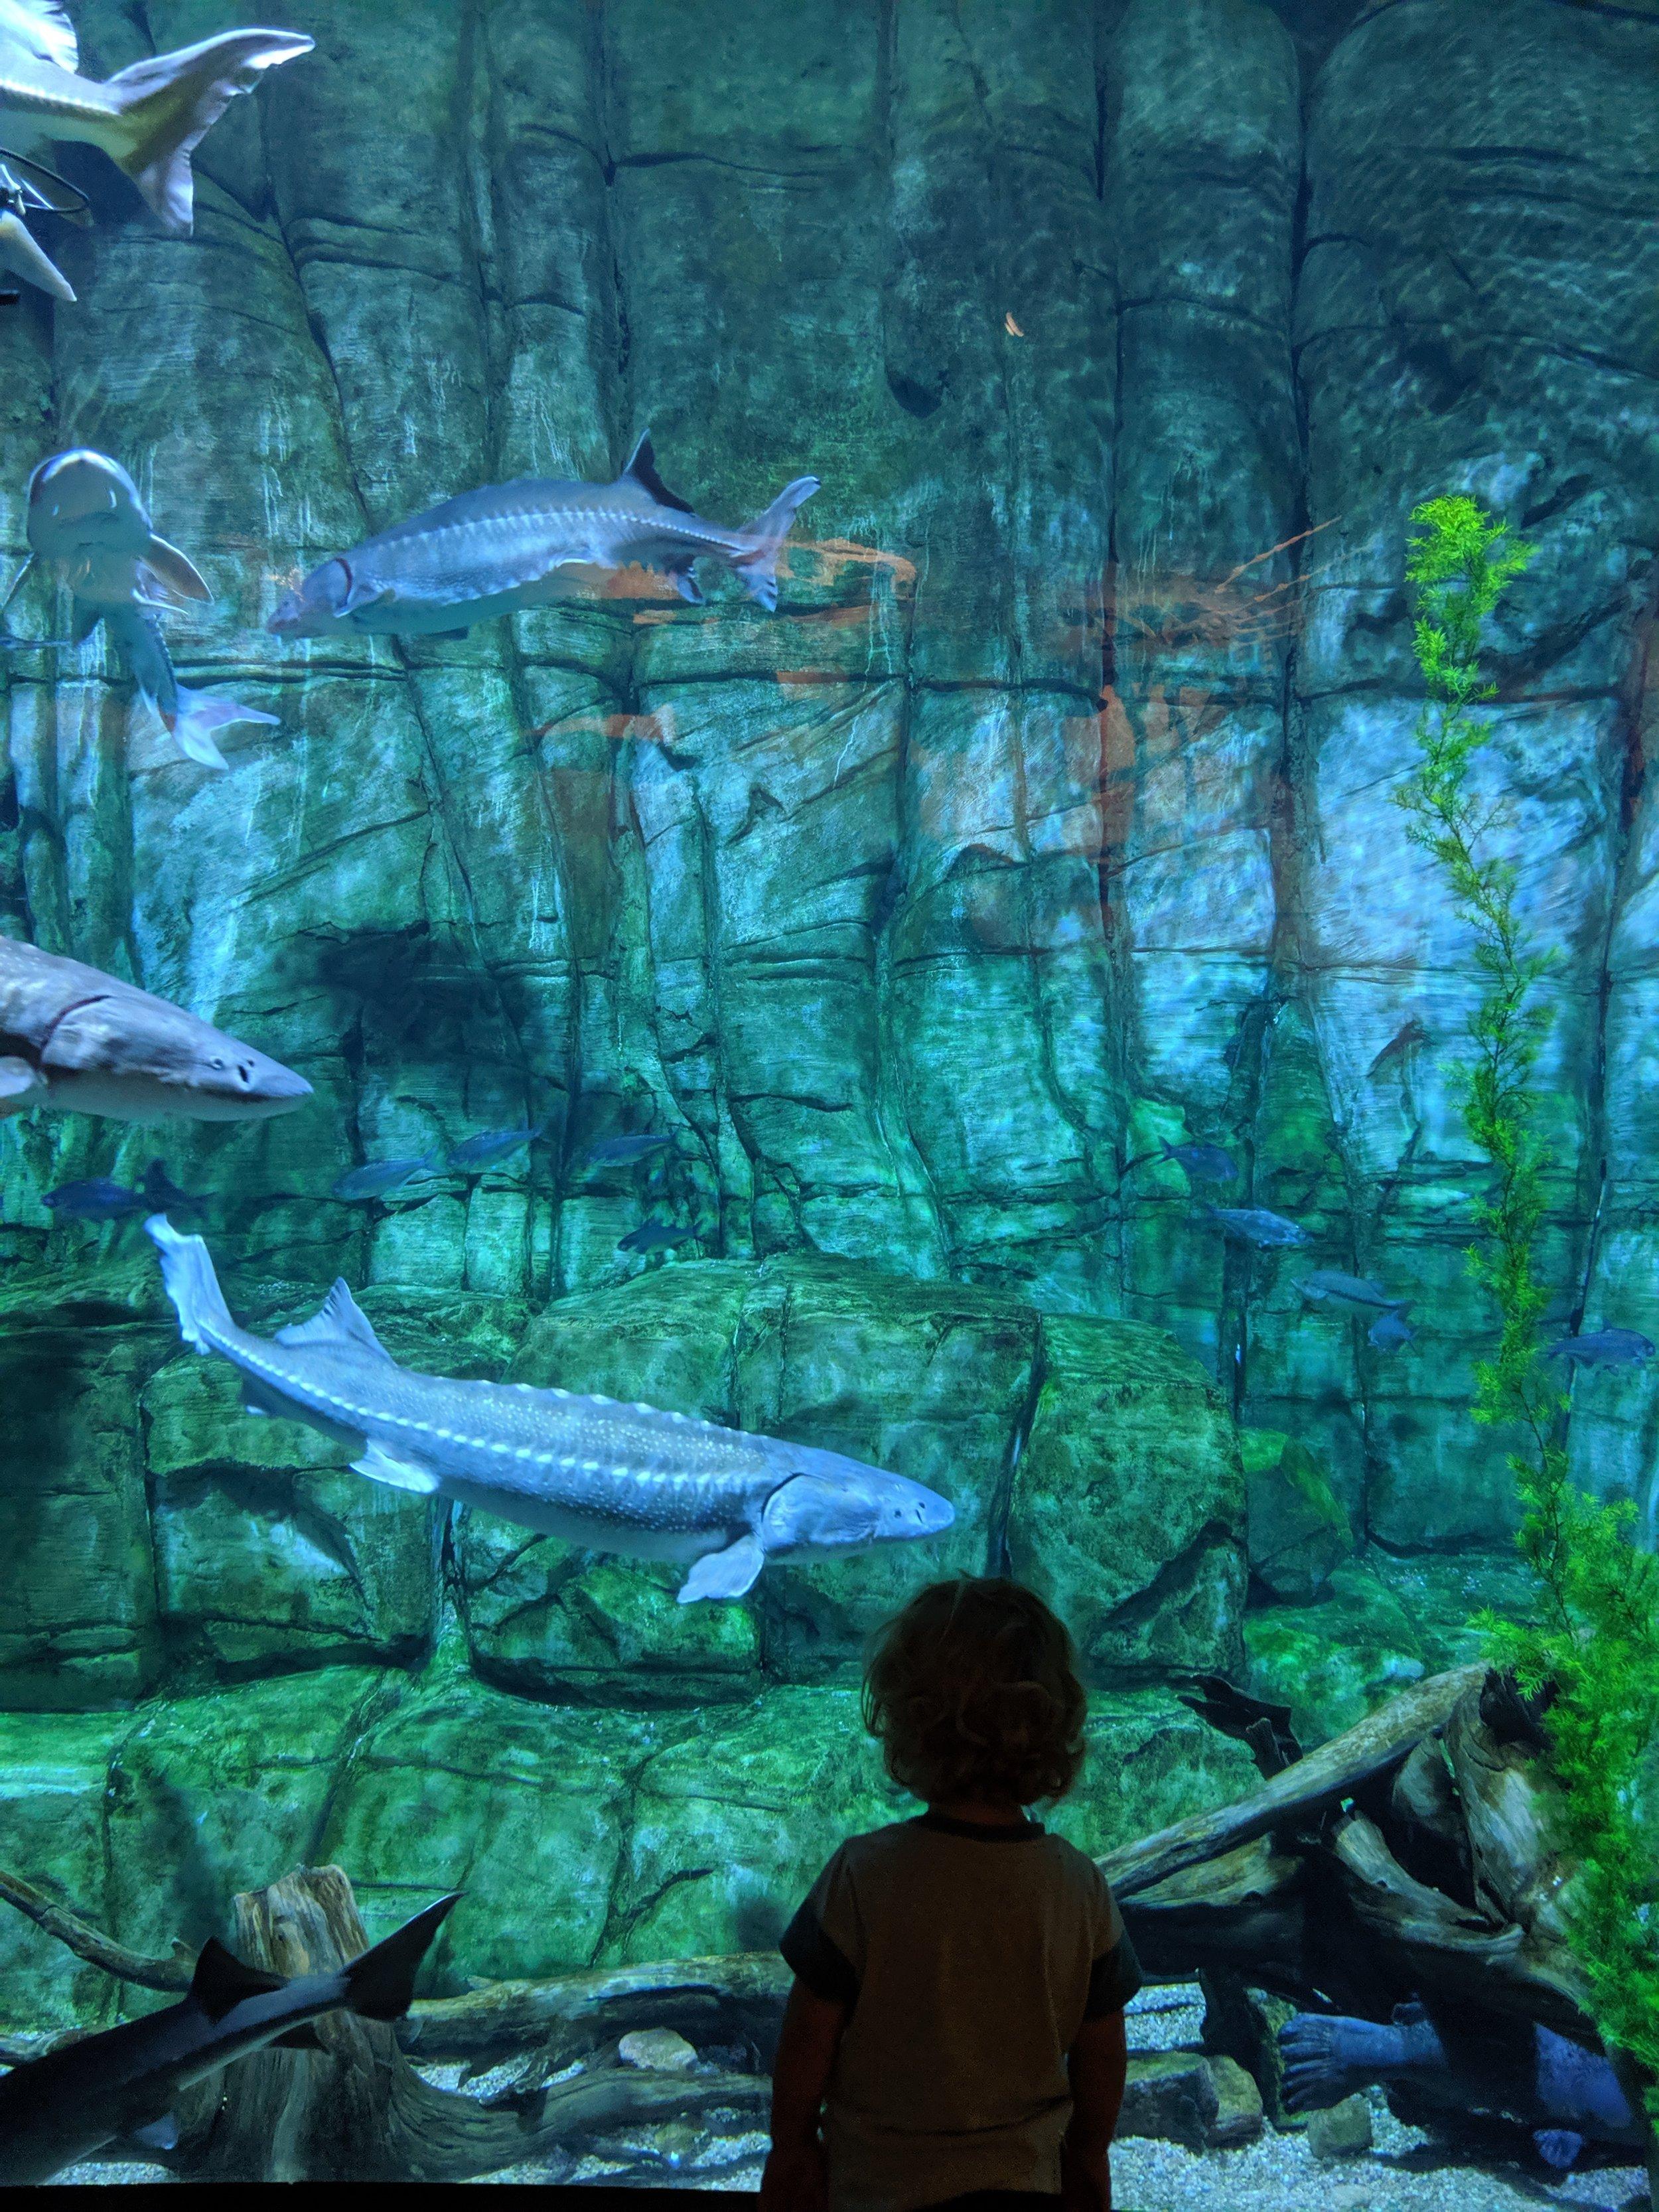 Fresh water fish at Denver's Downtown Aquarium in Denver, Colorado.